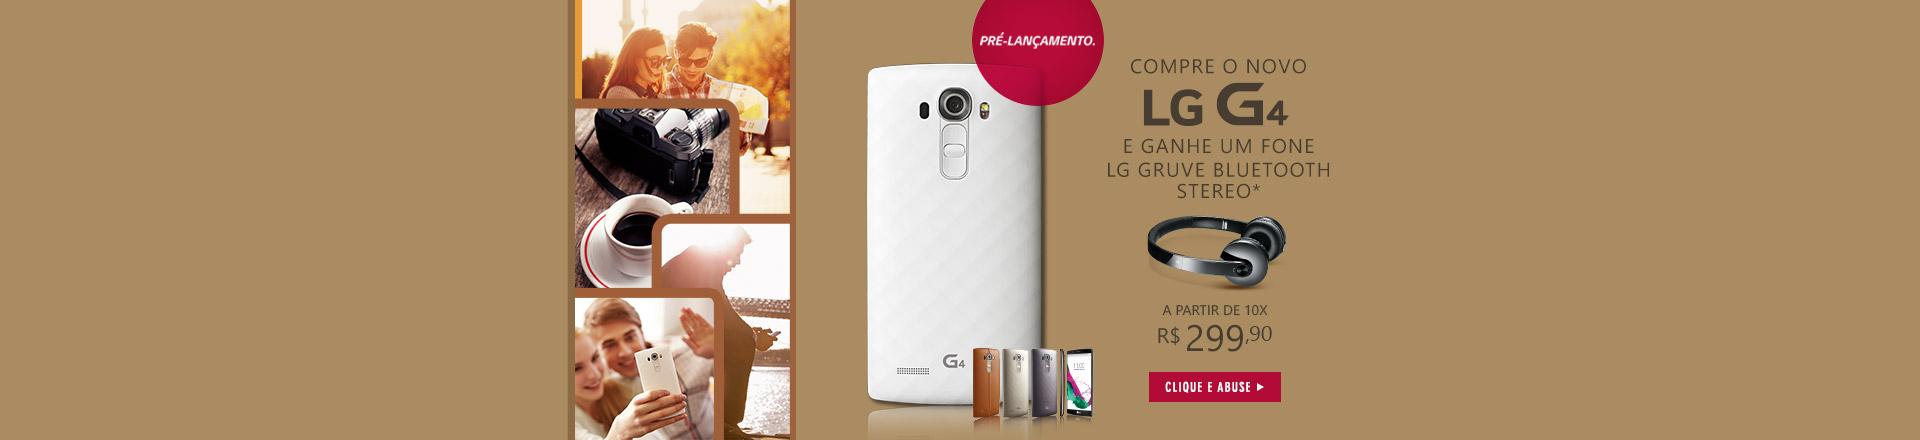 DEST22 FT LG G4